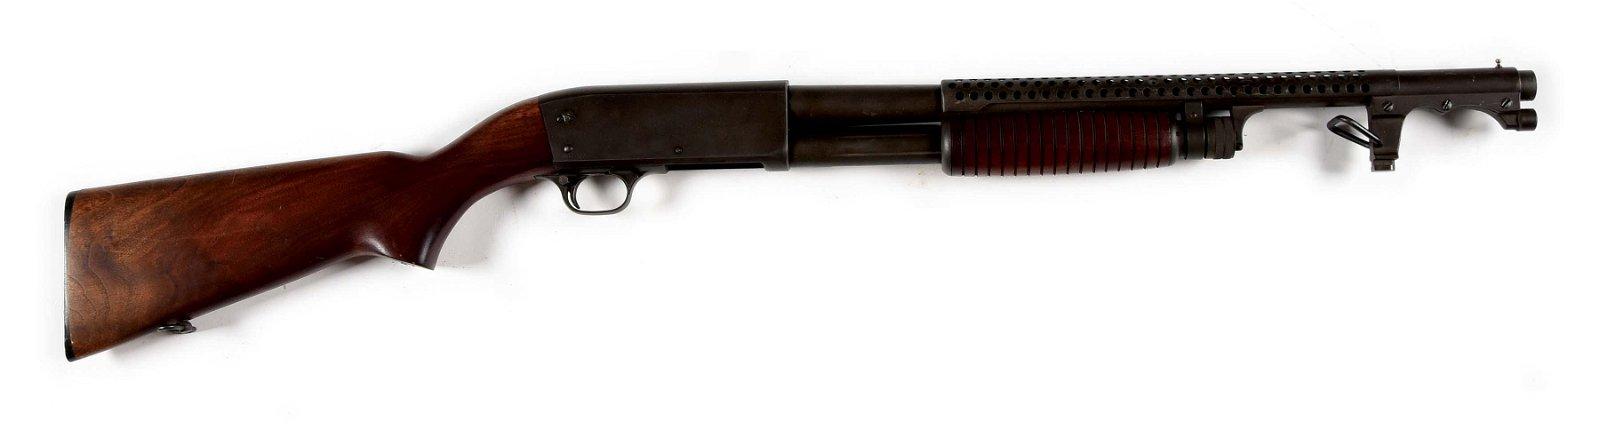 (C) SCARCE ITHACA MODEL 37 TRENCH SHOTGUN, MADE IN